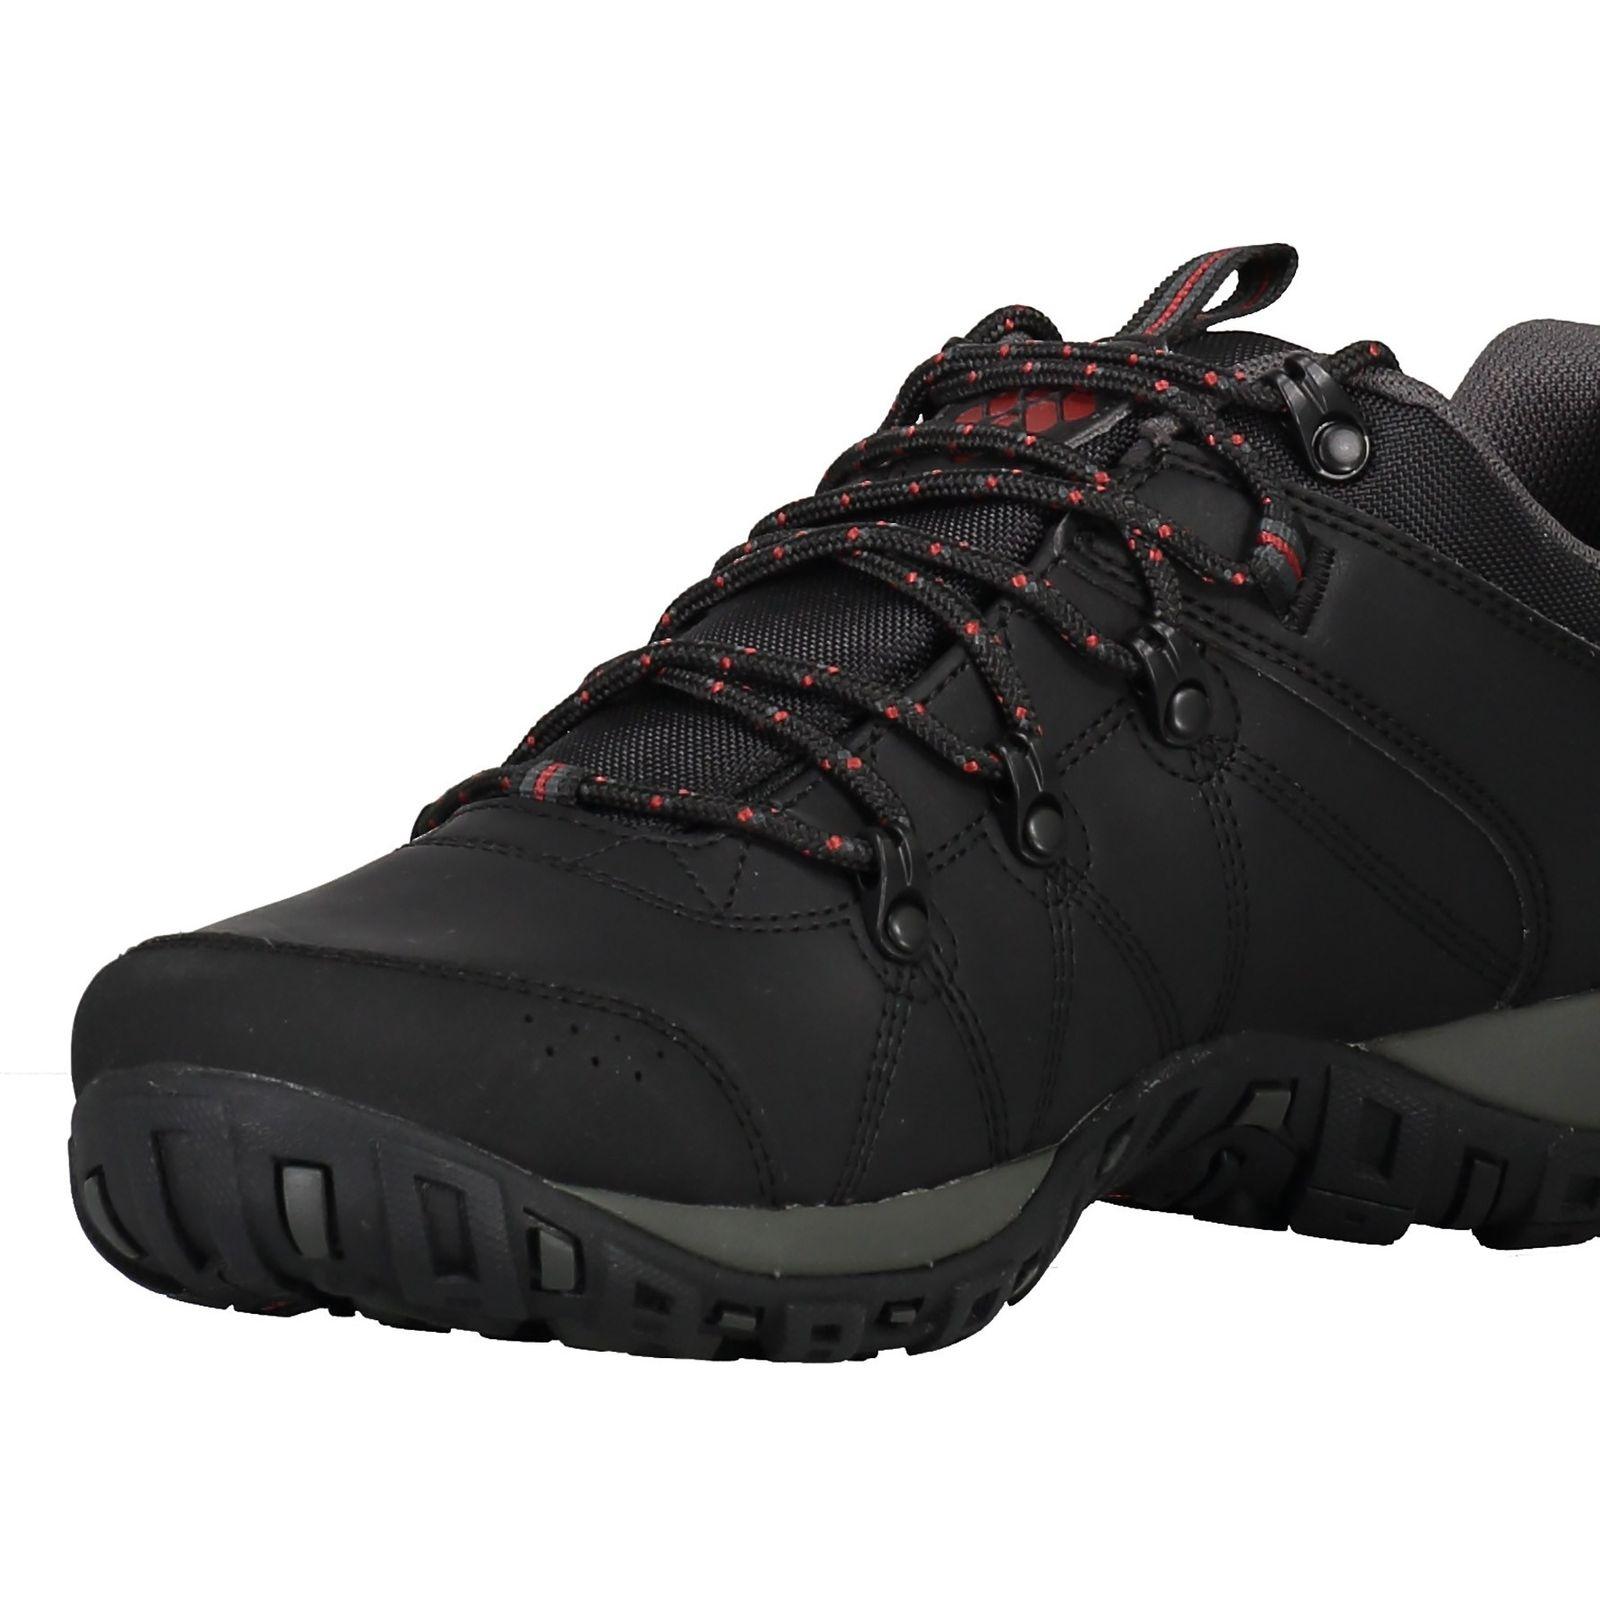 کفش طبیعت گردی بندی مردانه Peakfreak Venture - کلمبیا - مشکي - 6